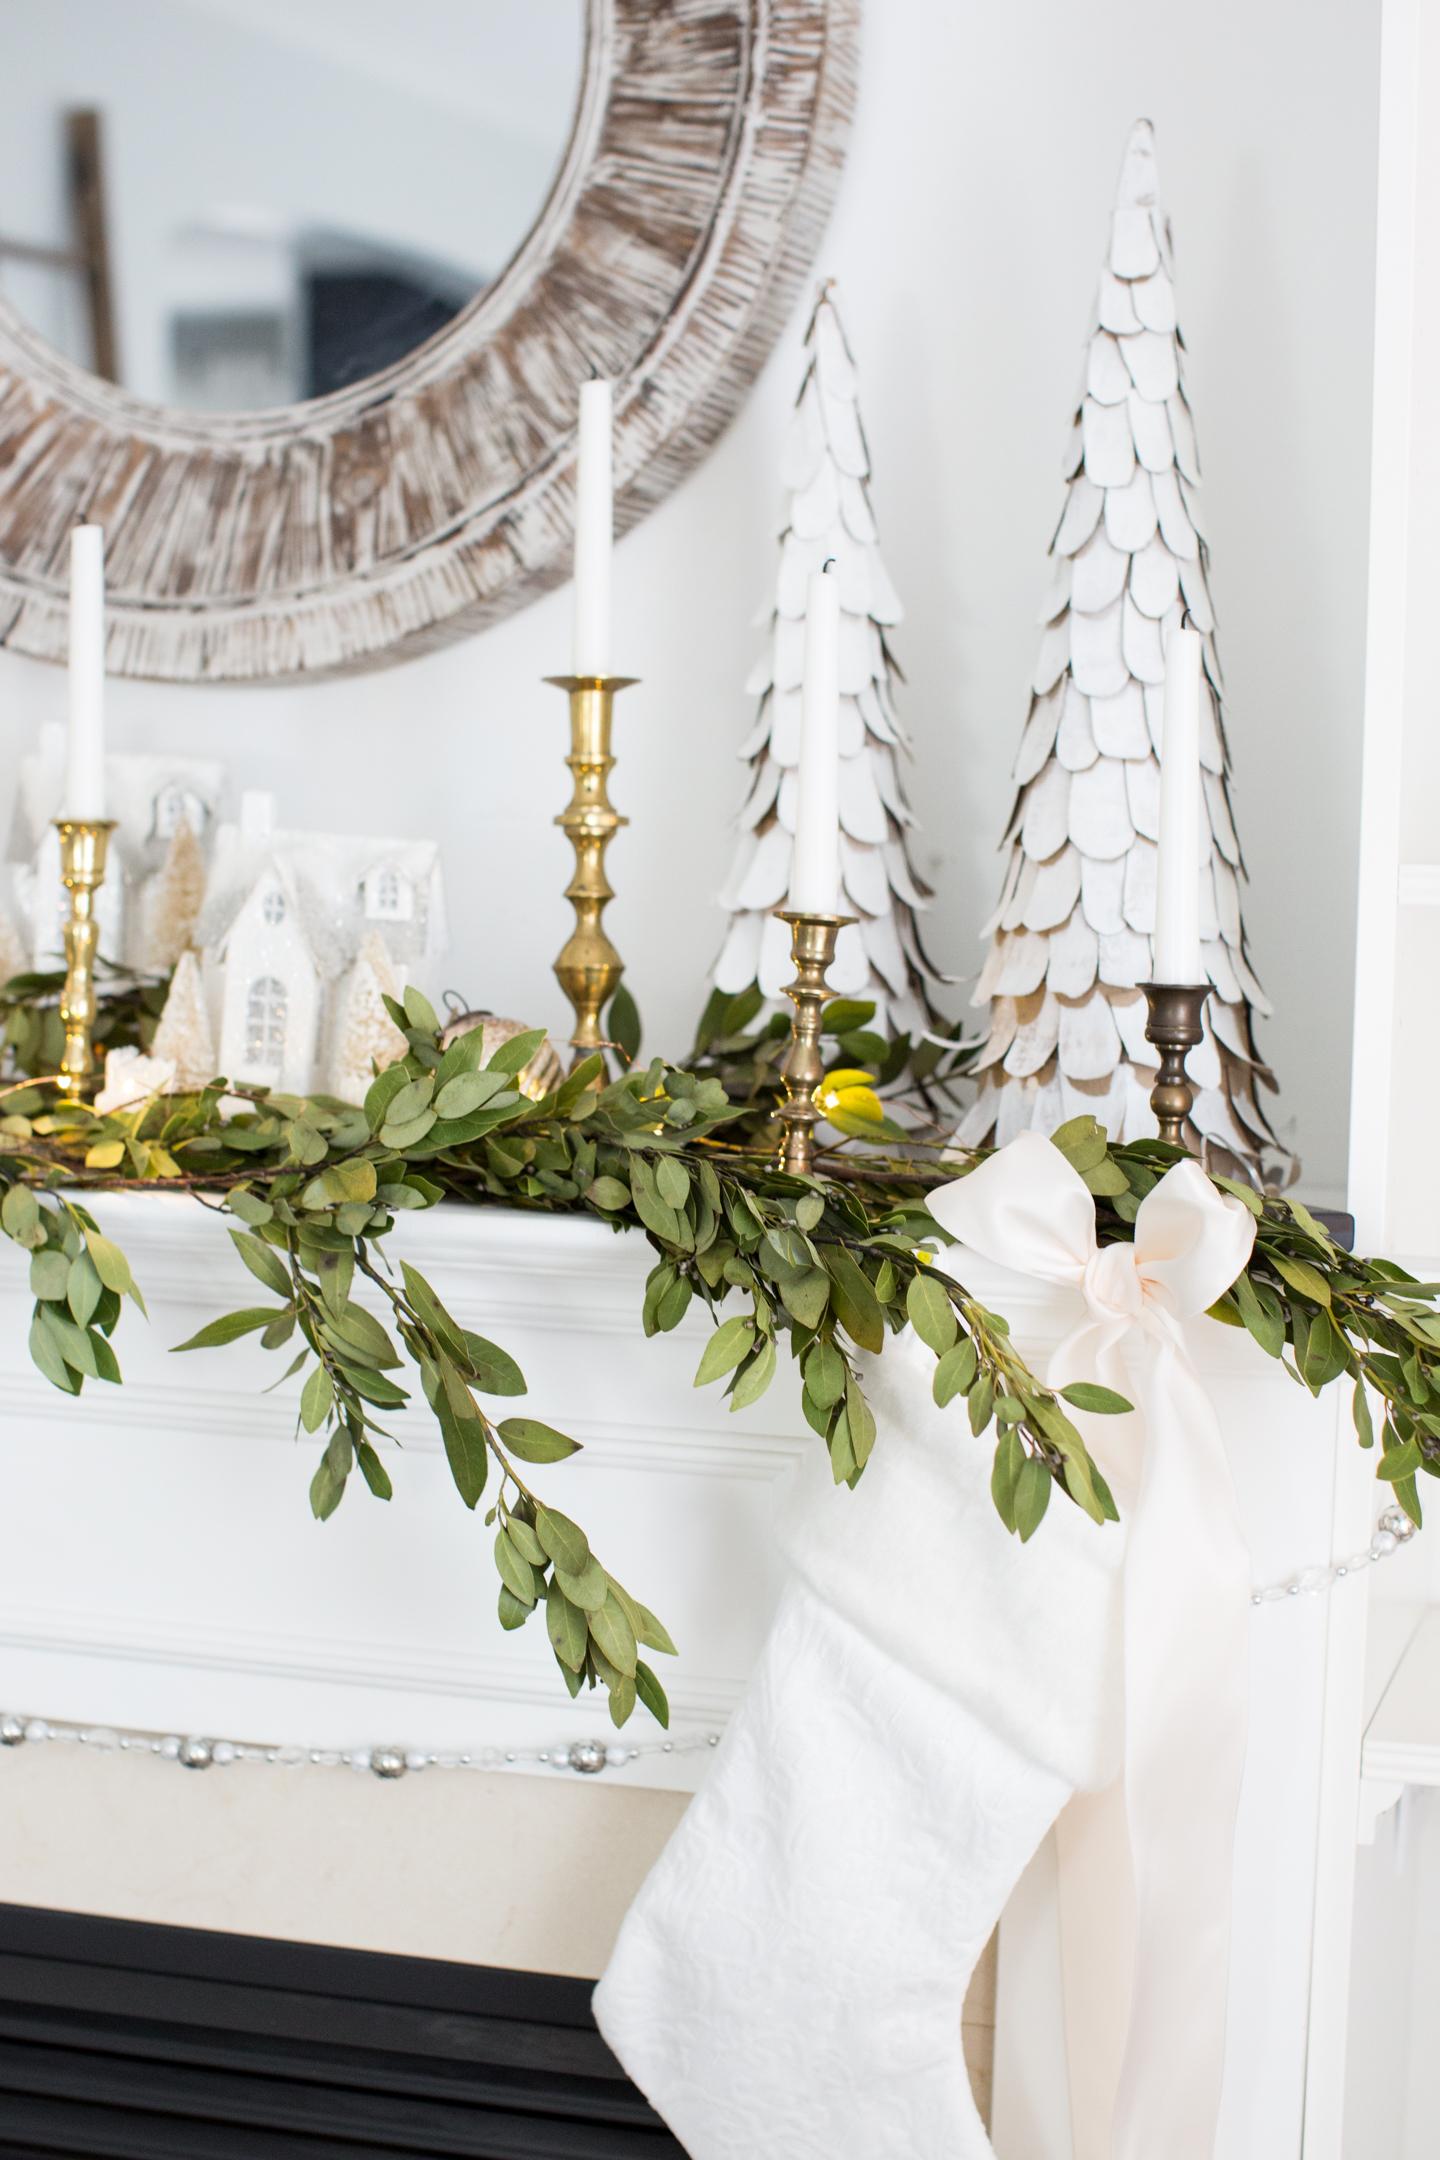 christmasfamilyroomcraftberrybush-21